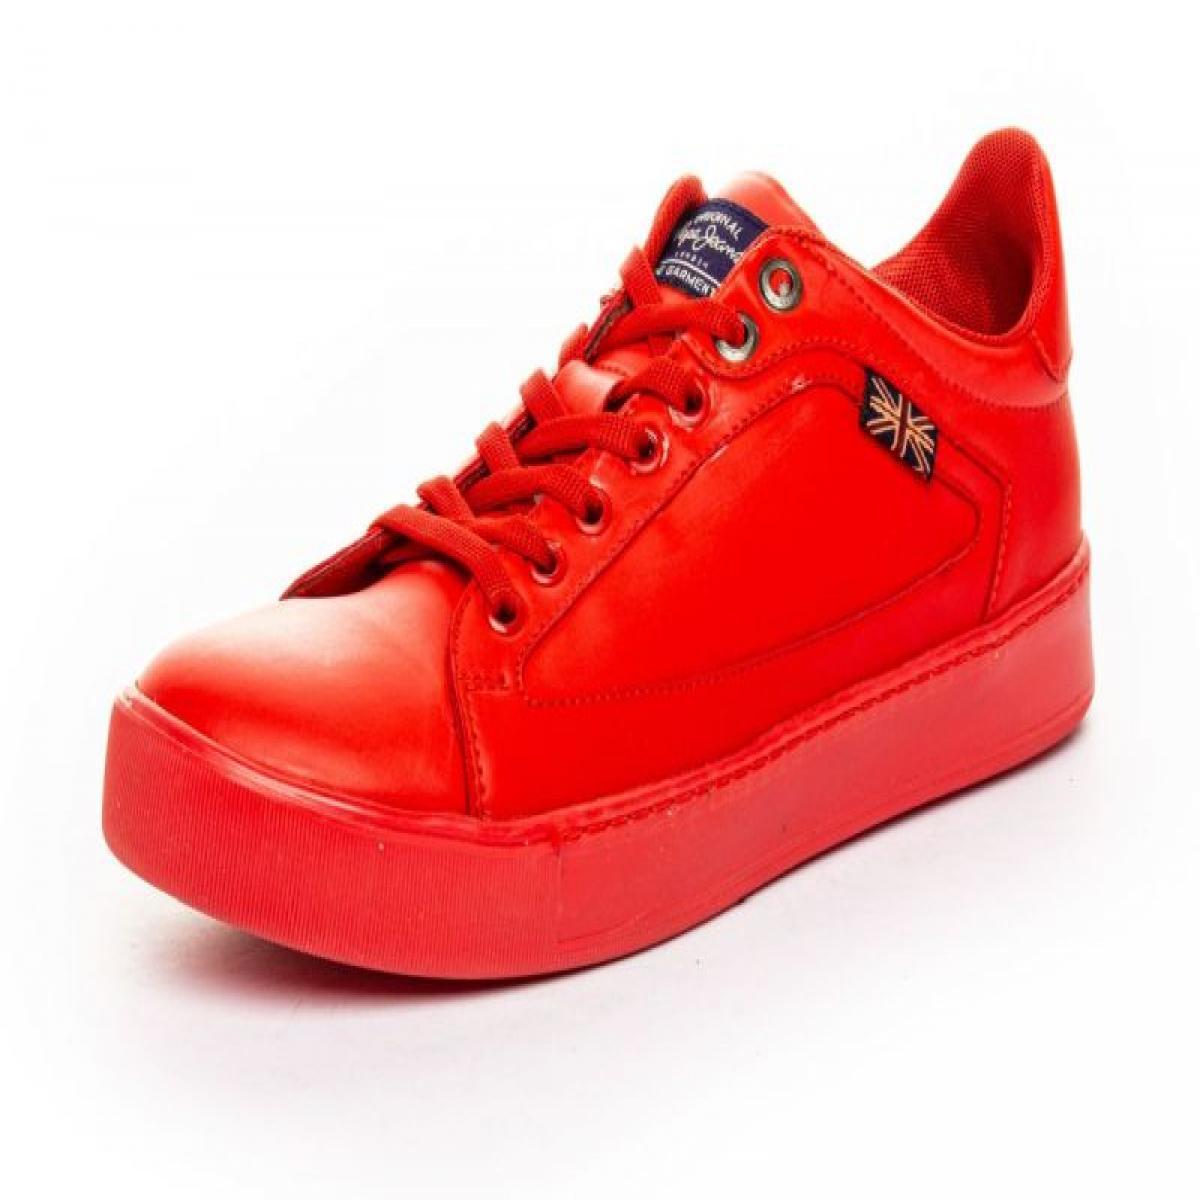 40562432a Tenis marca Pepe Jeans modelo WAYNE Color Rojo